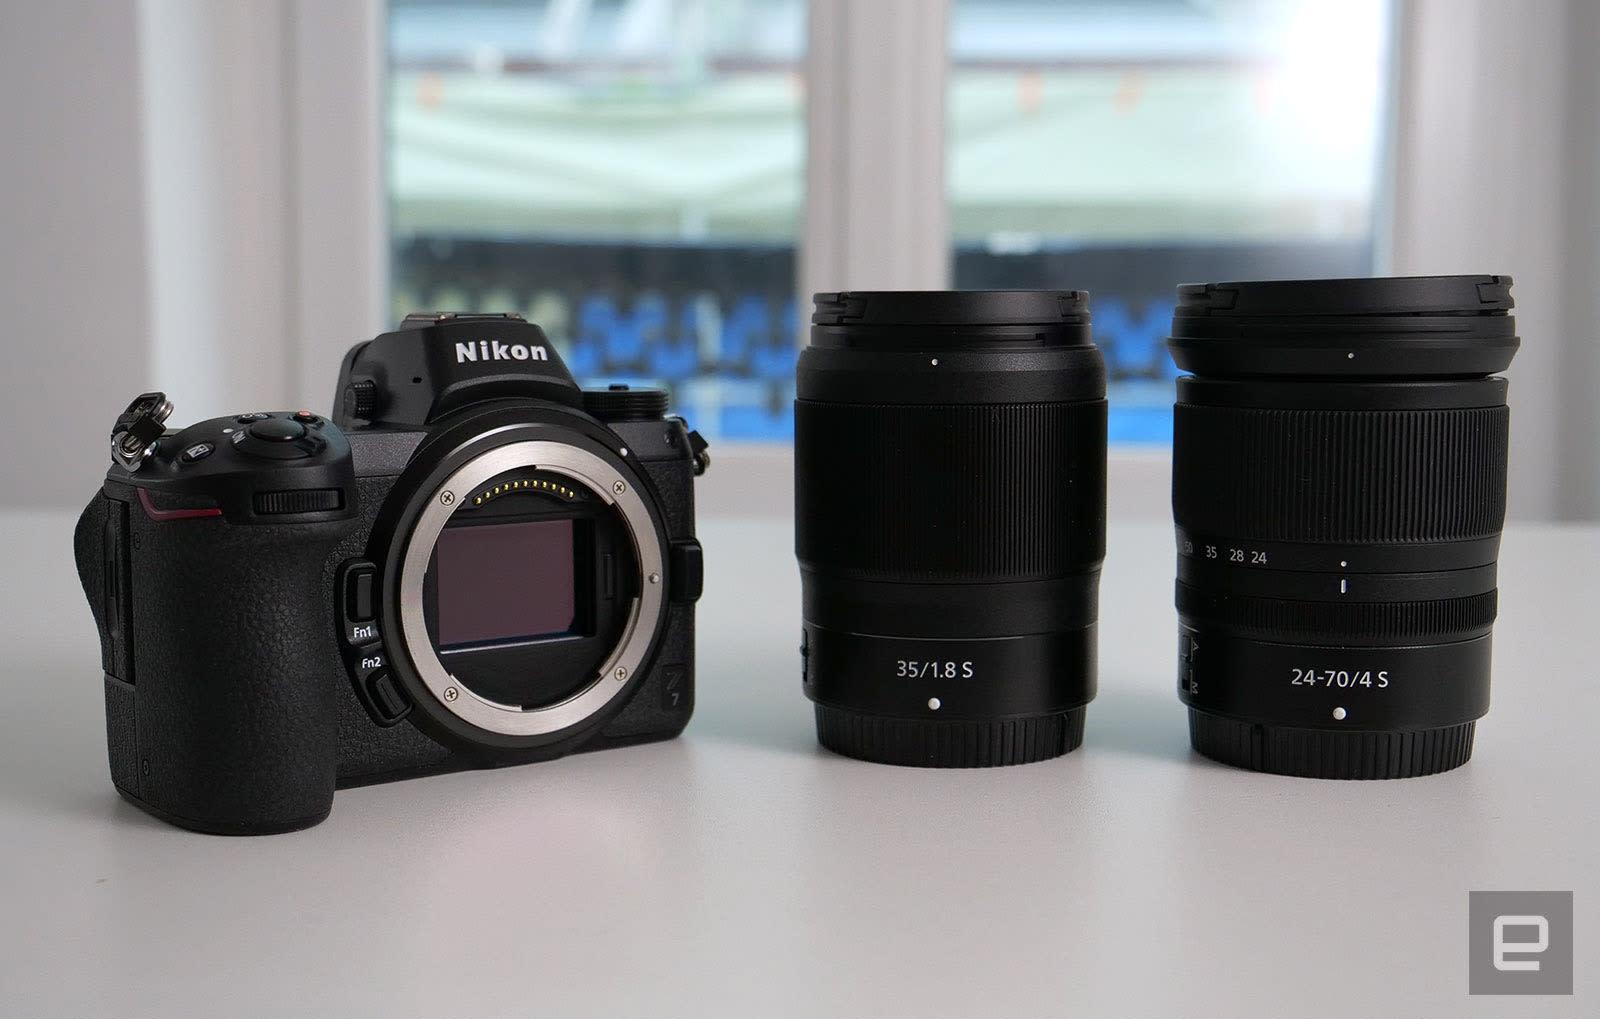 Nikon Z7 review: Great photos, great video, imperfect autofocus